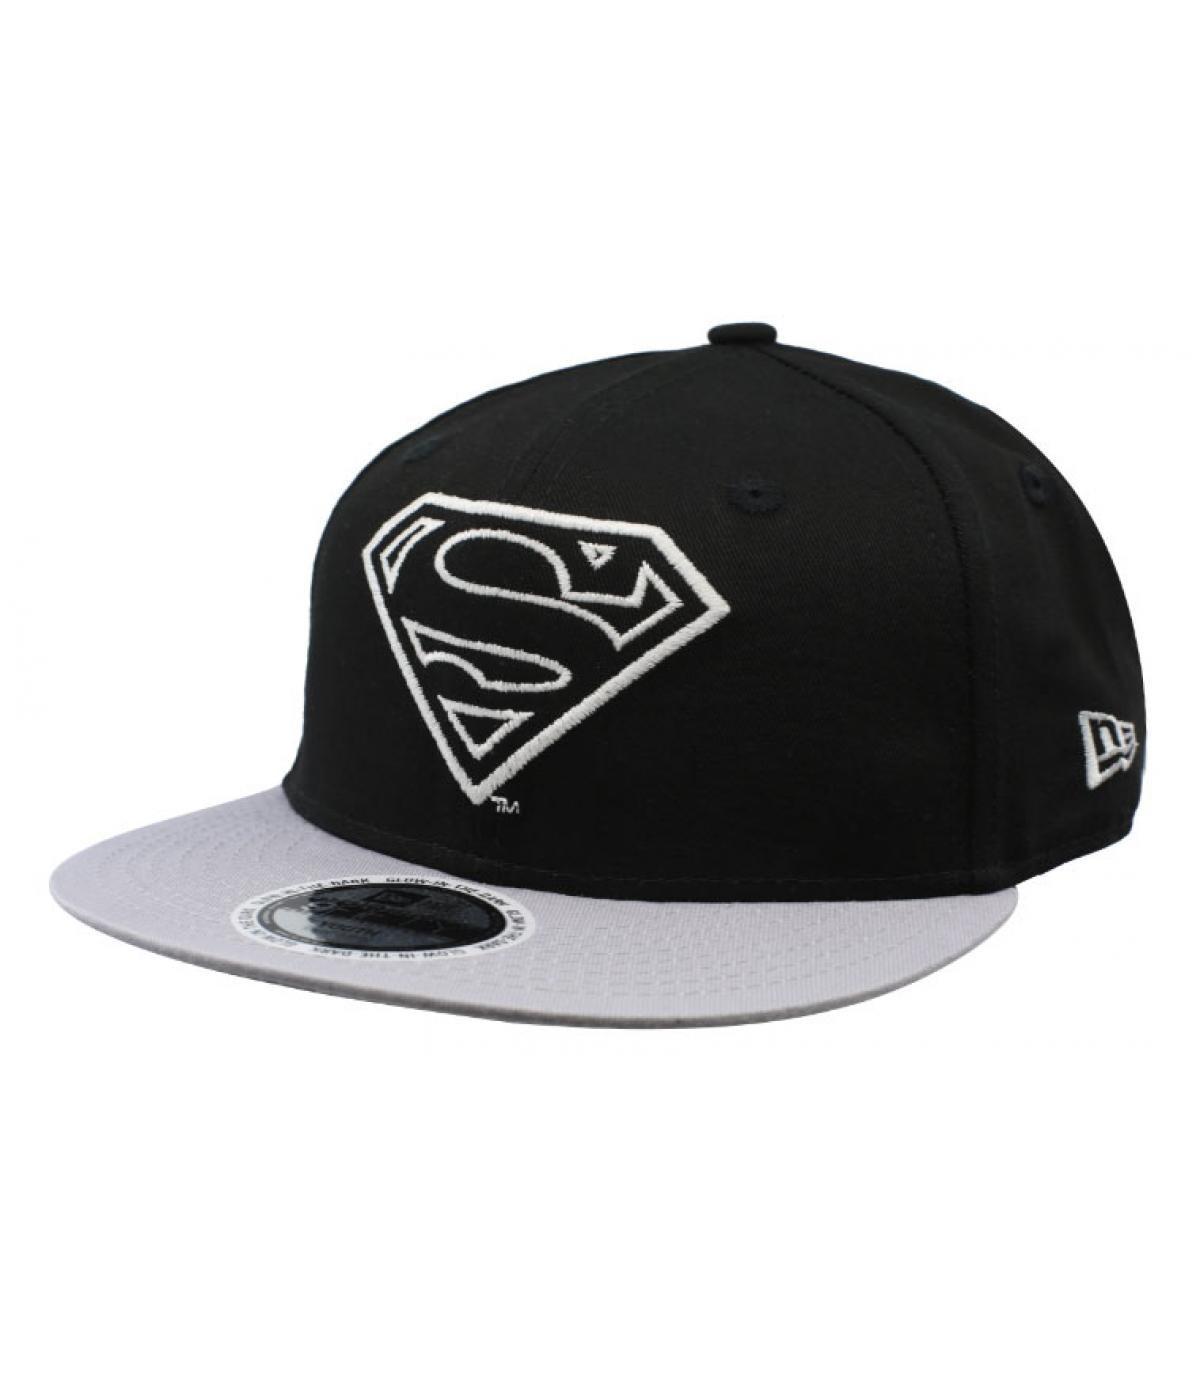 Détails Snapback Kids Superman GITD black - image 2